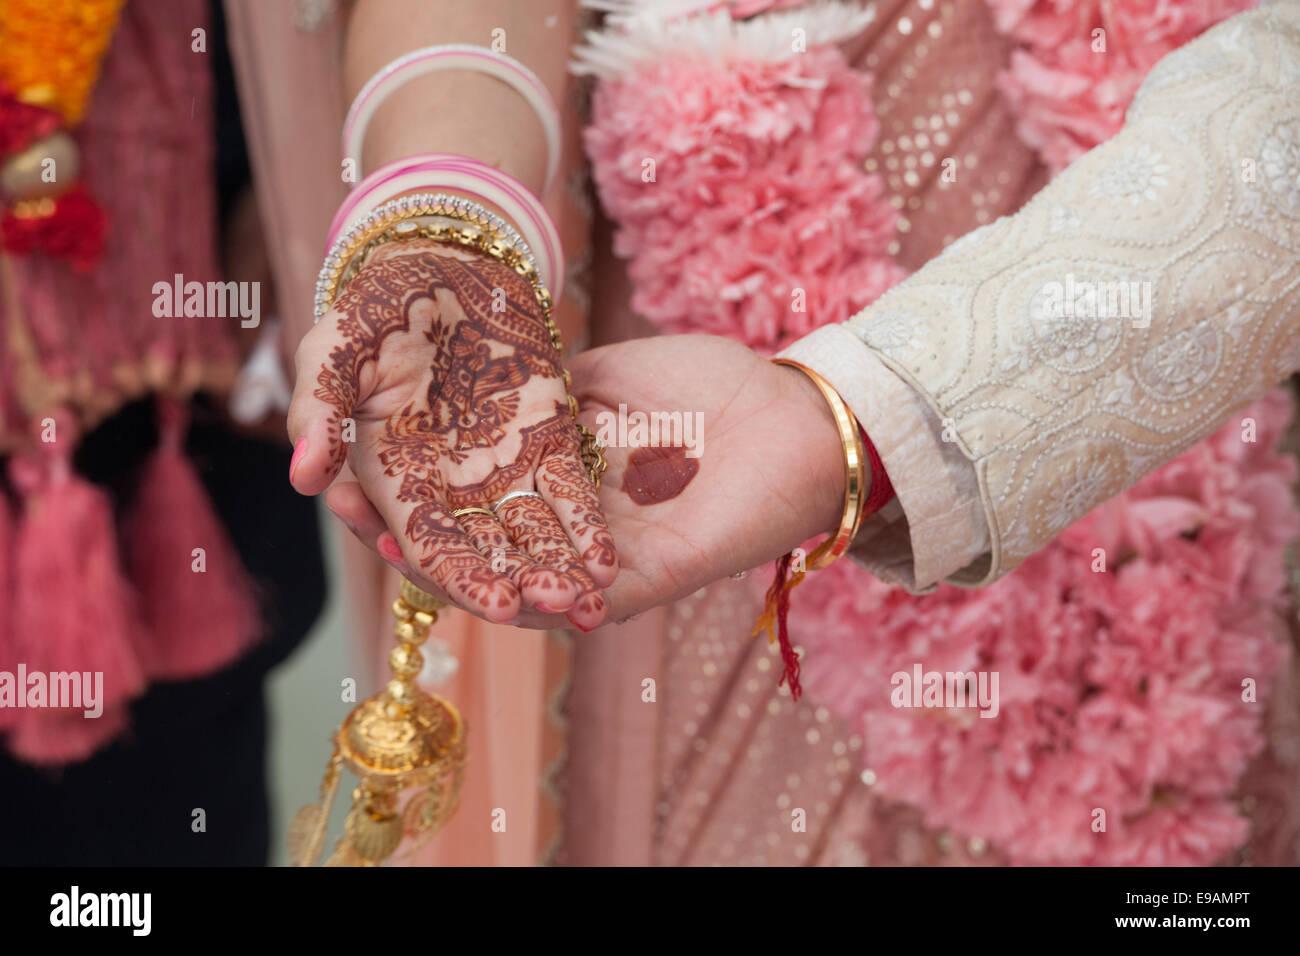 Varmala Imágenes De Stock & Varmala Fotos De Stock - Alamy